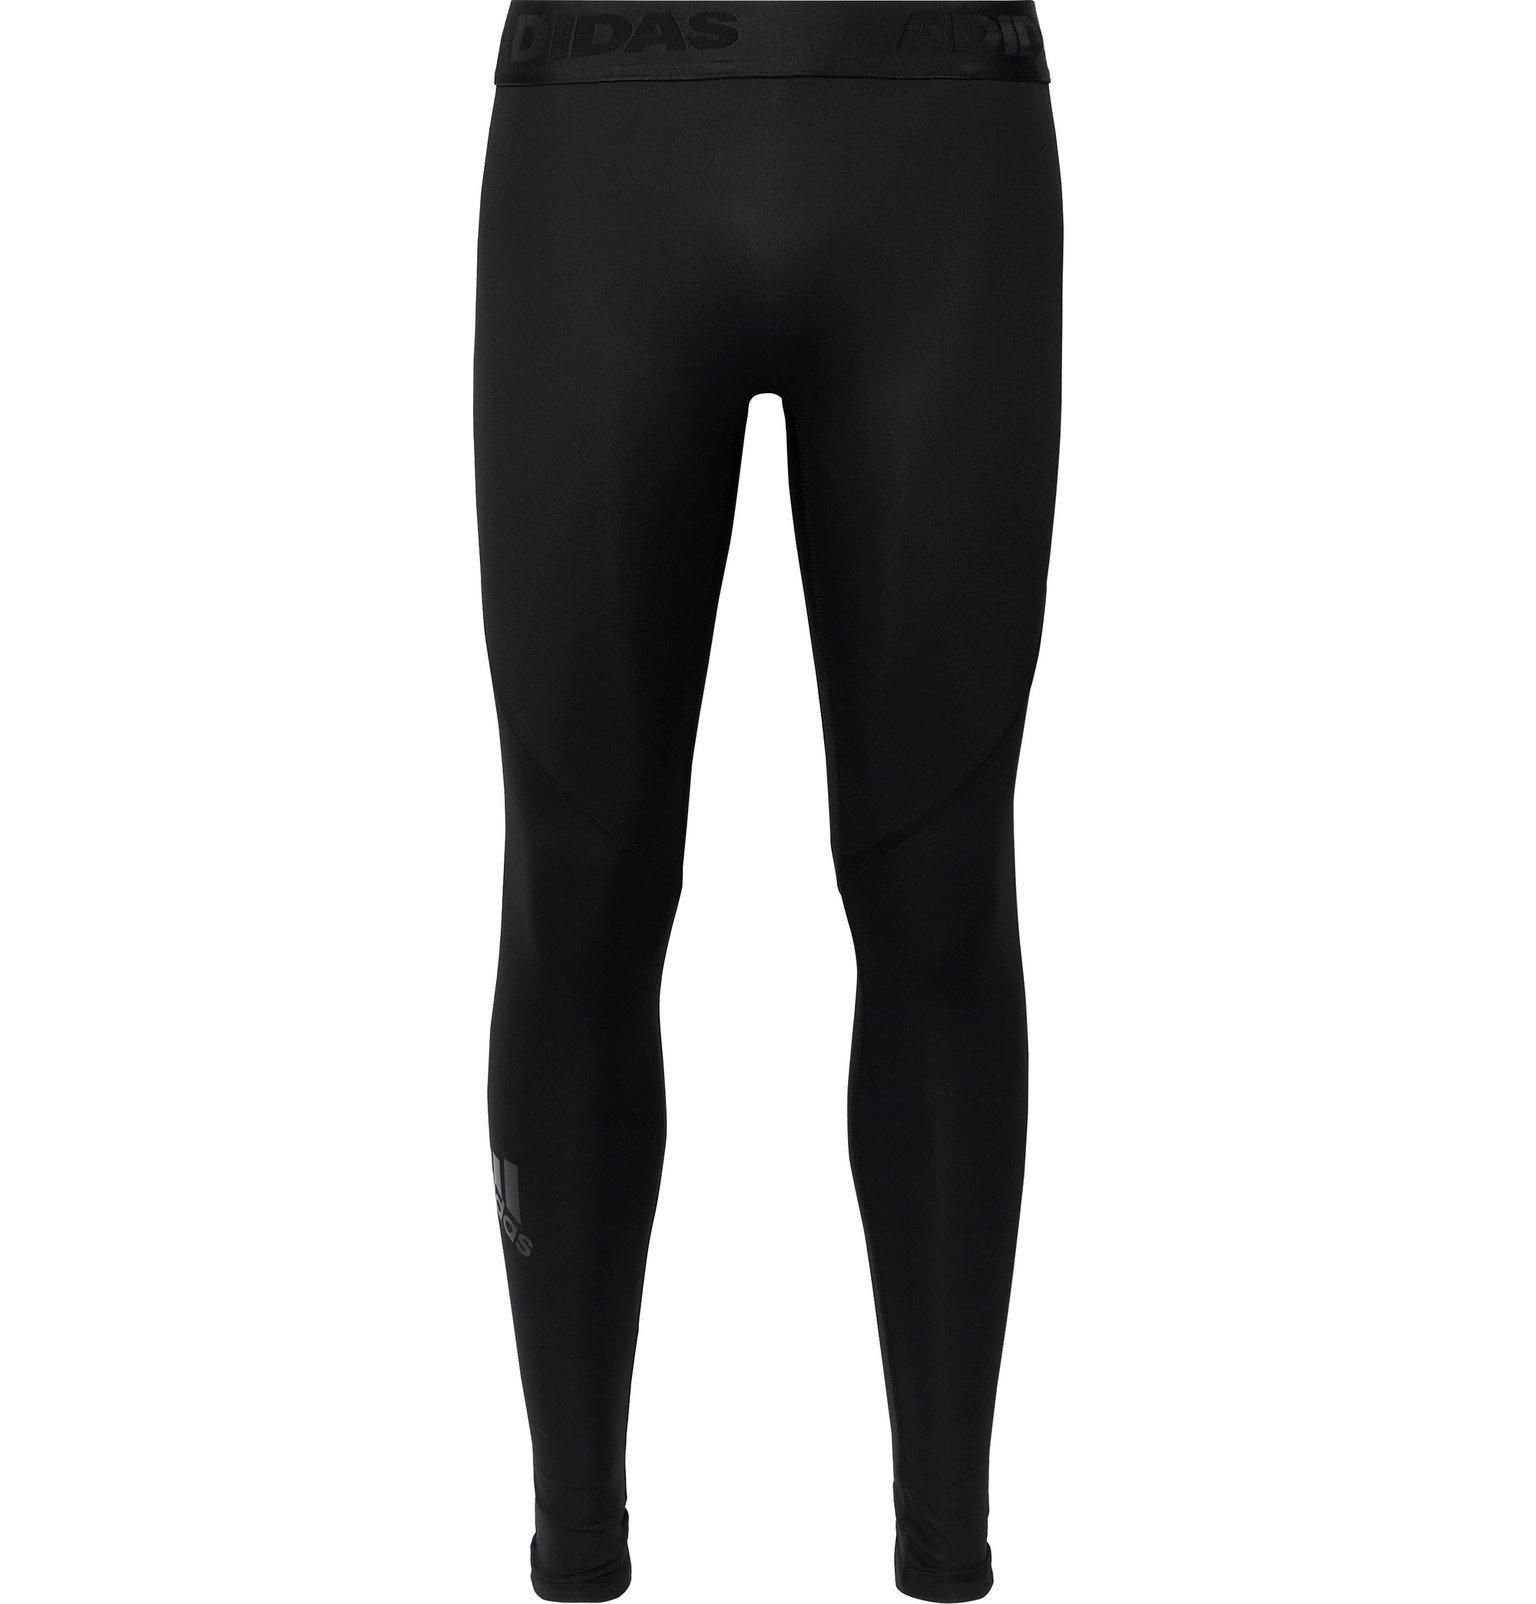 Adidas Sport - Alphaskin Mesh-Panelled Climacool Compression Tights - Black